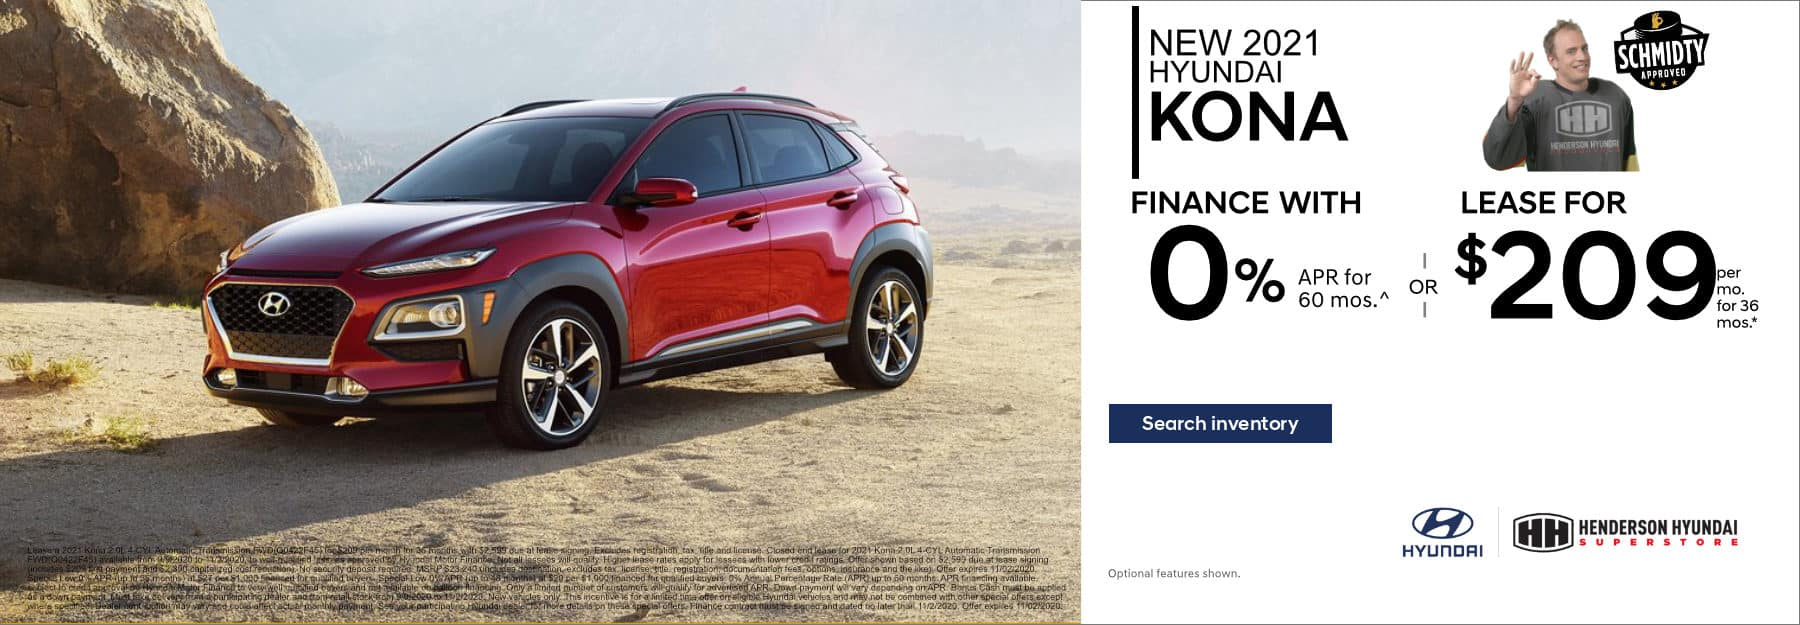 September-2020_2021 Kona_Henderson_Hyundai_1400x514